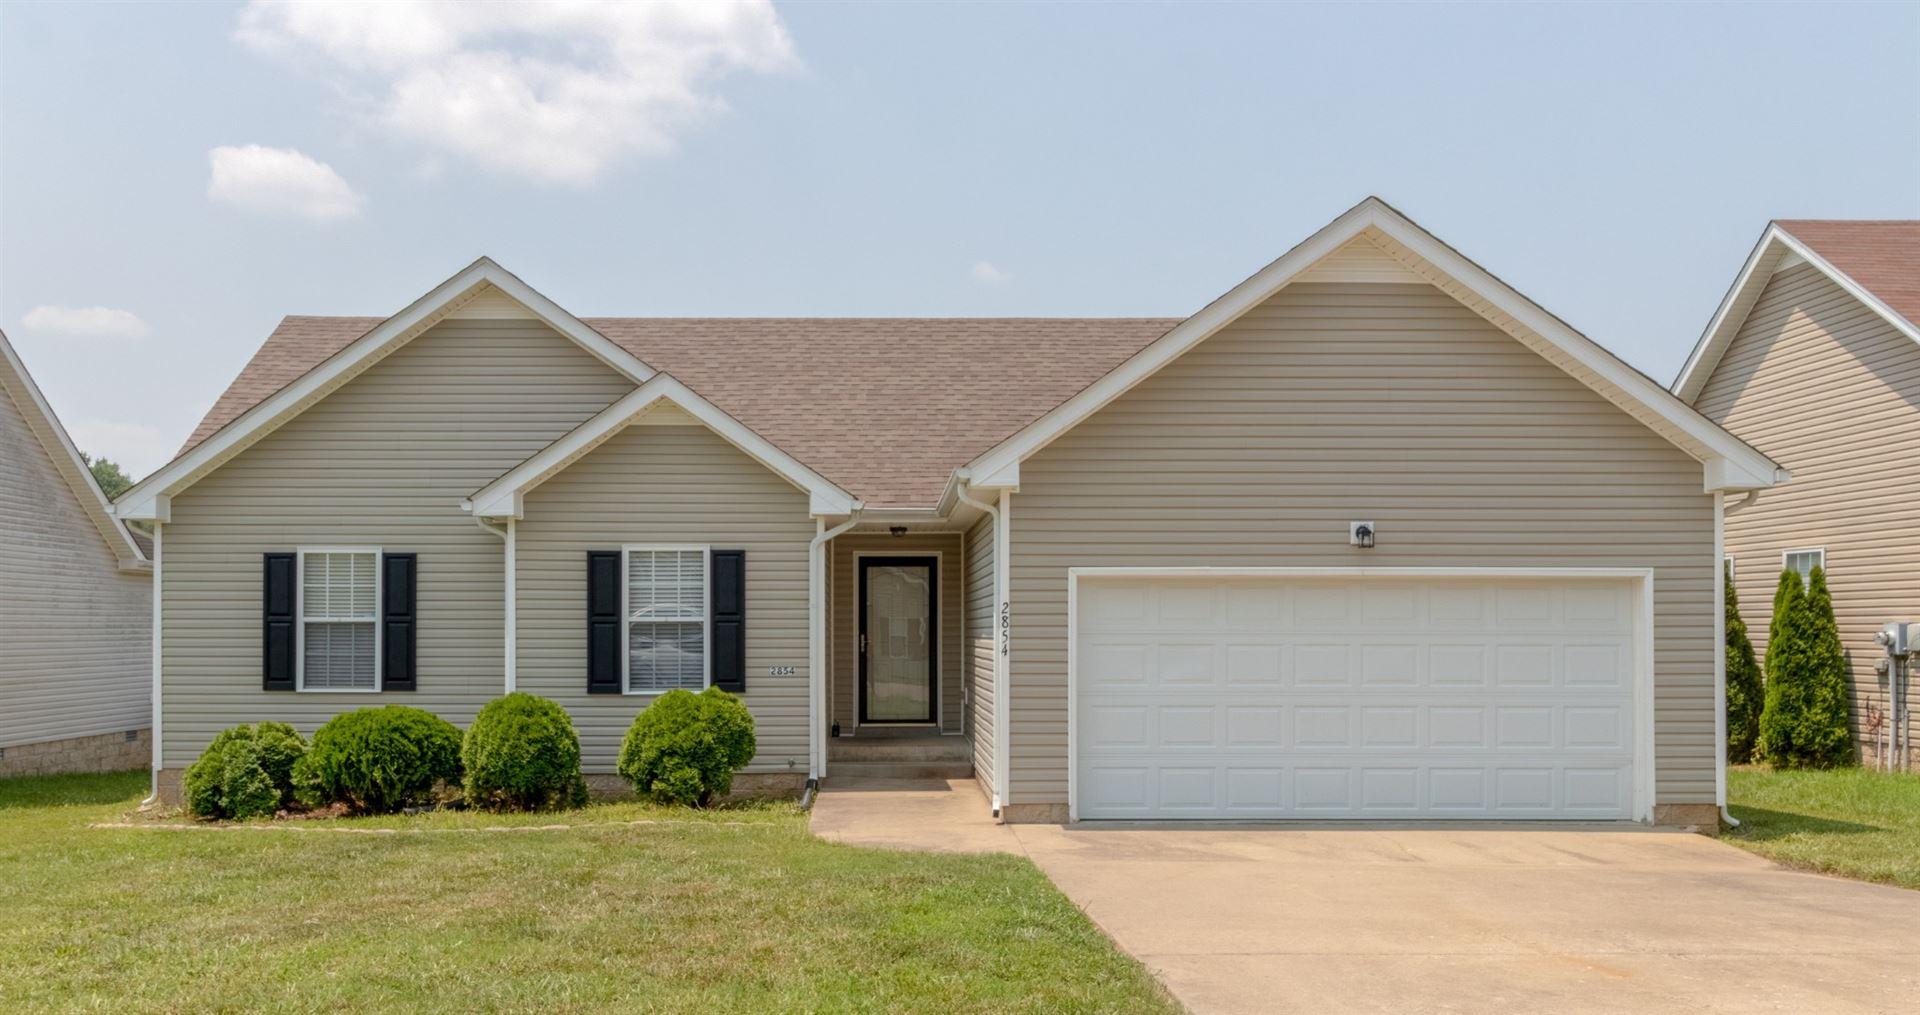 Photo of 2854 Teakwood Dr, Clarksville, TN 37040 (MLS # 2275655)